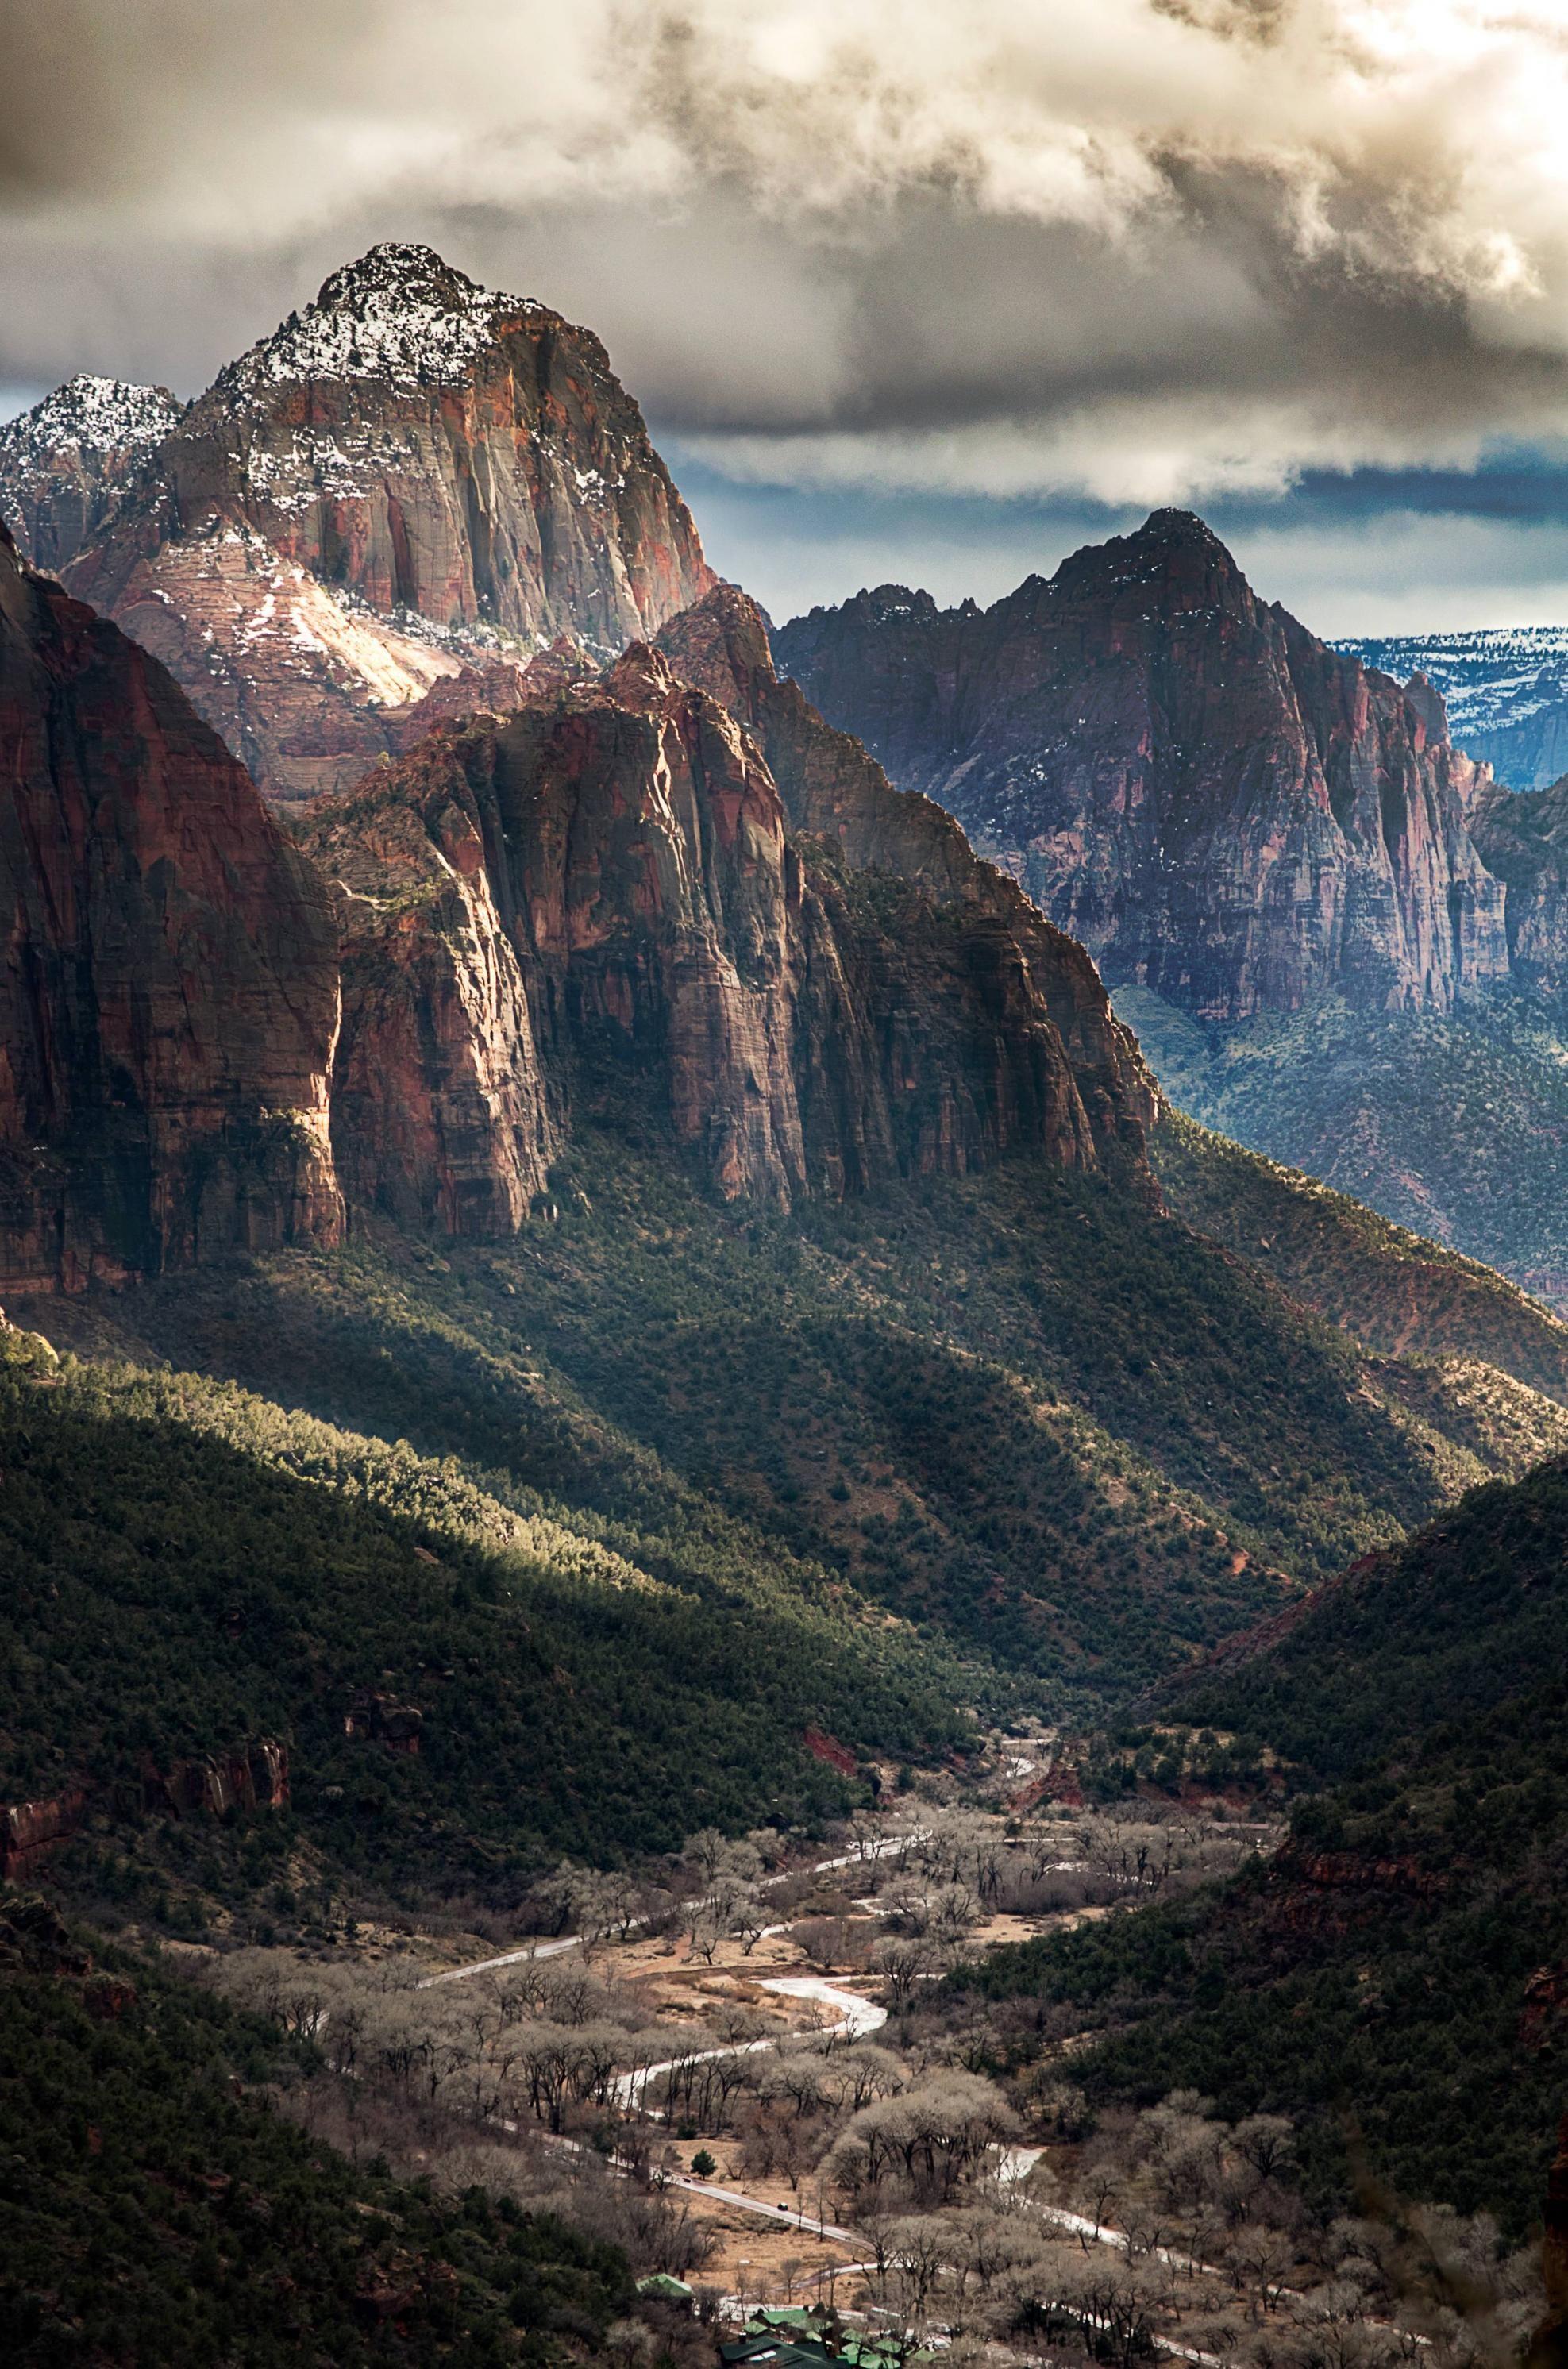 Zion National Park Ut 2822 4263 Oc Reddit National Parks